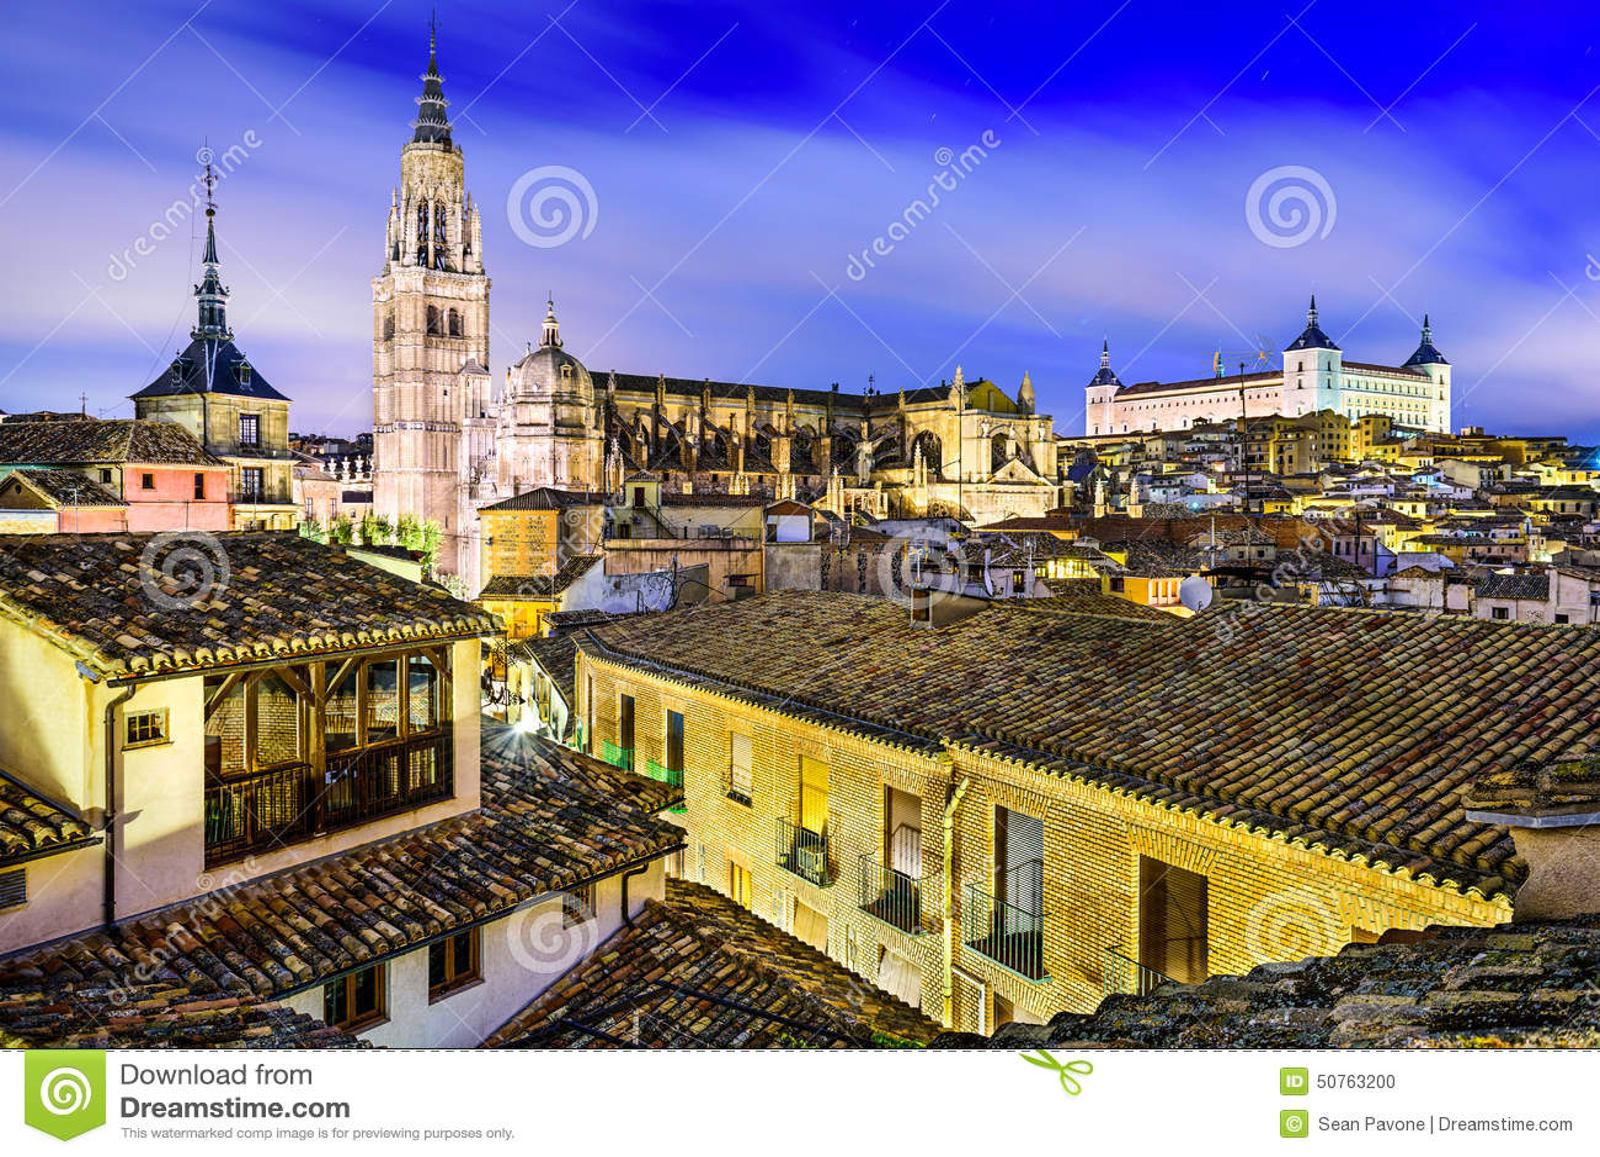 Toledo, Spain Old City Stock Photo - Image: 50763200